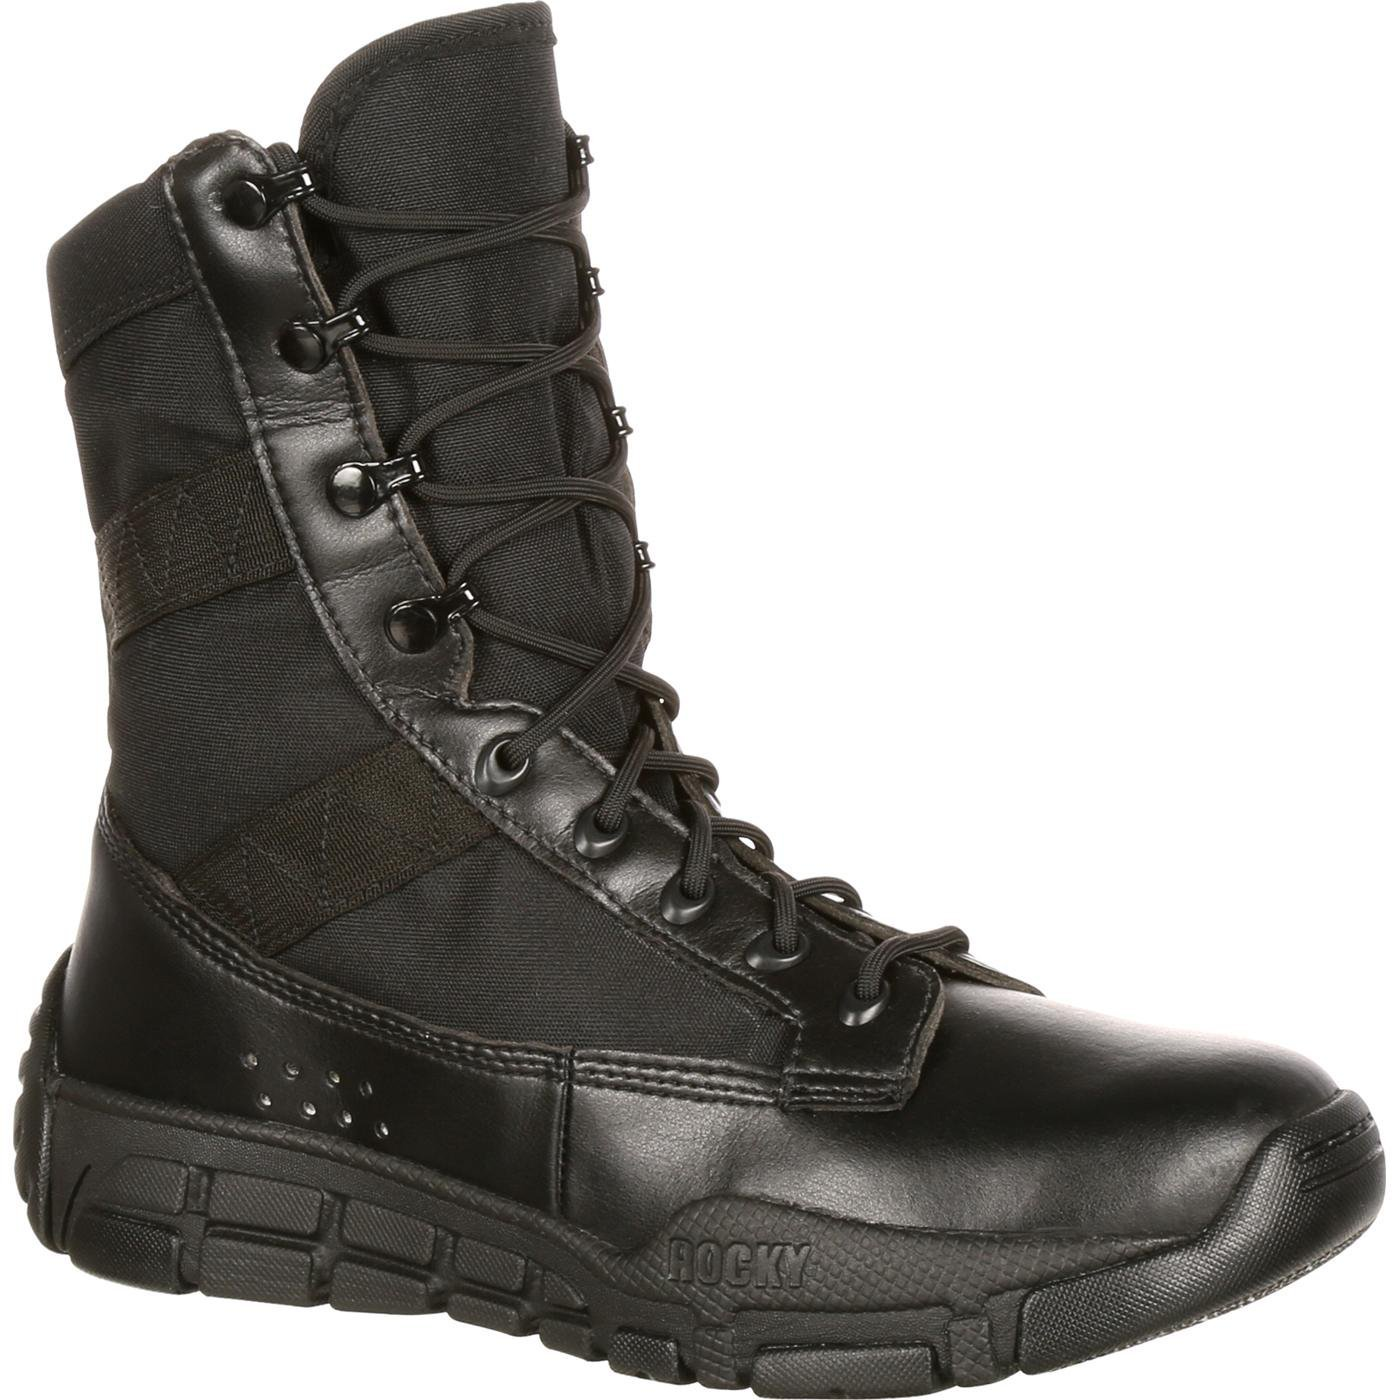 Rocky Men's RY008 Boot, Black, 9 M US